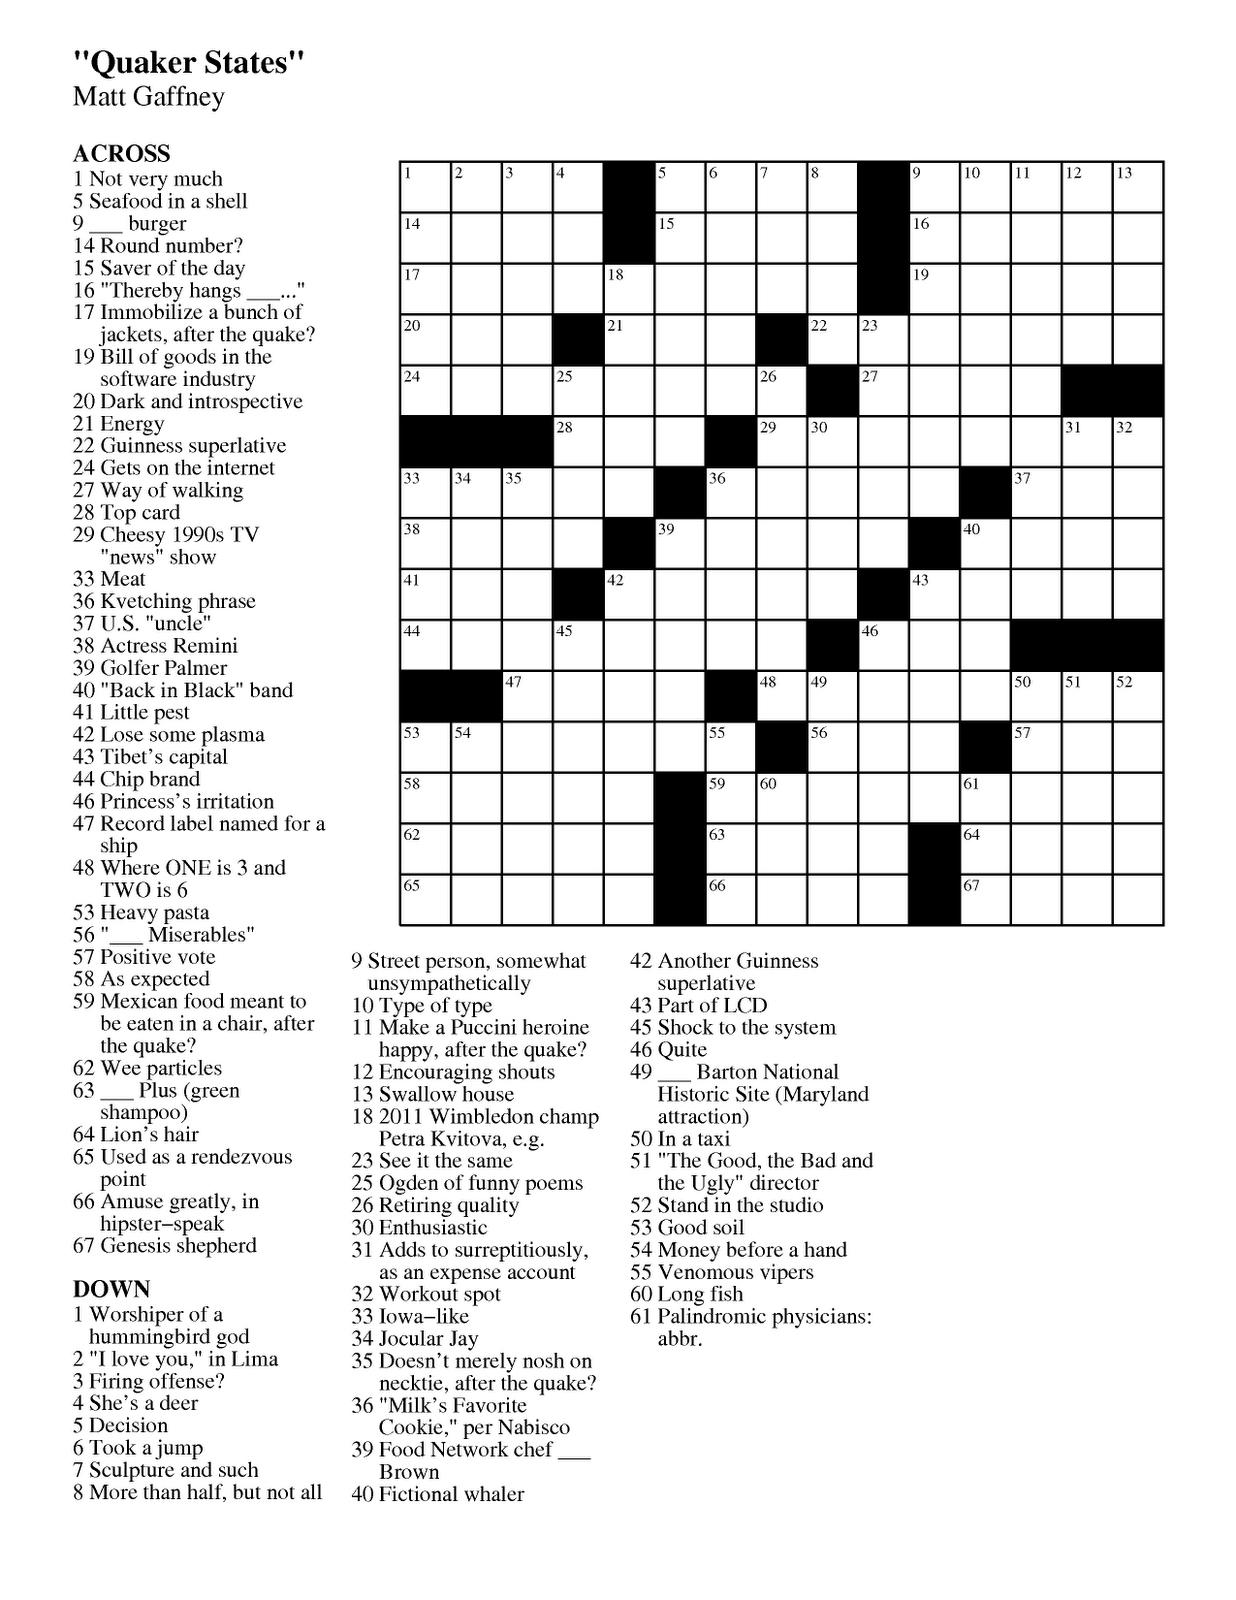 Free Printable Large Print Crossword Puzzles | M3U8 - Free Printable Summer Puzzles